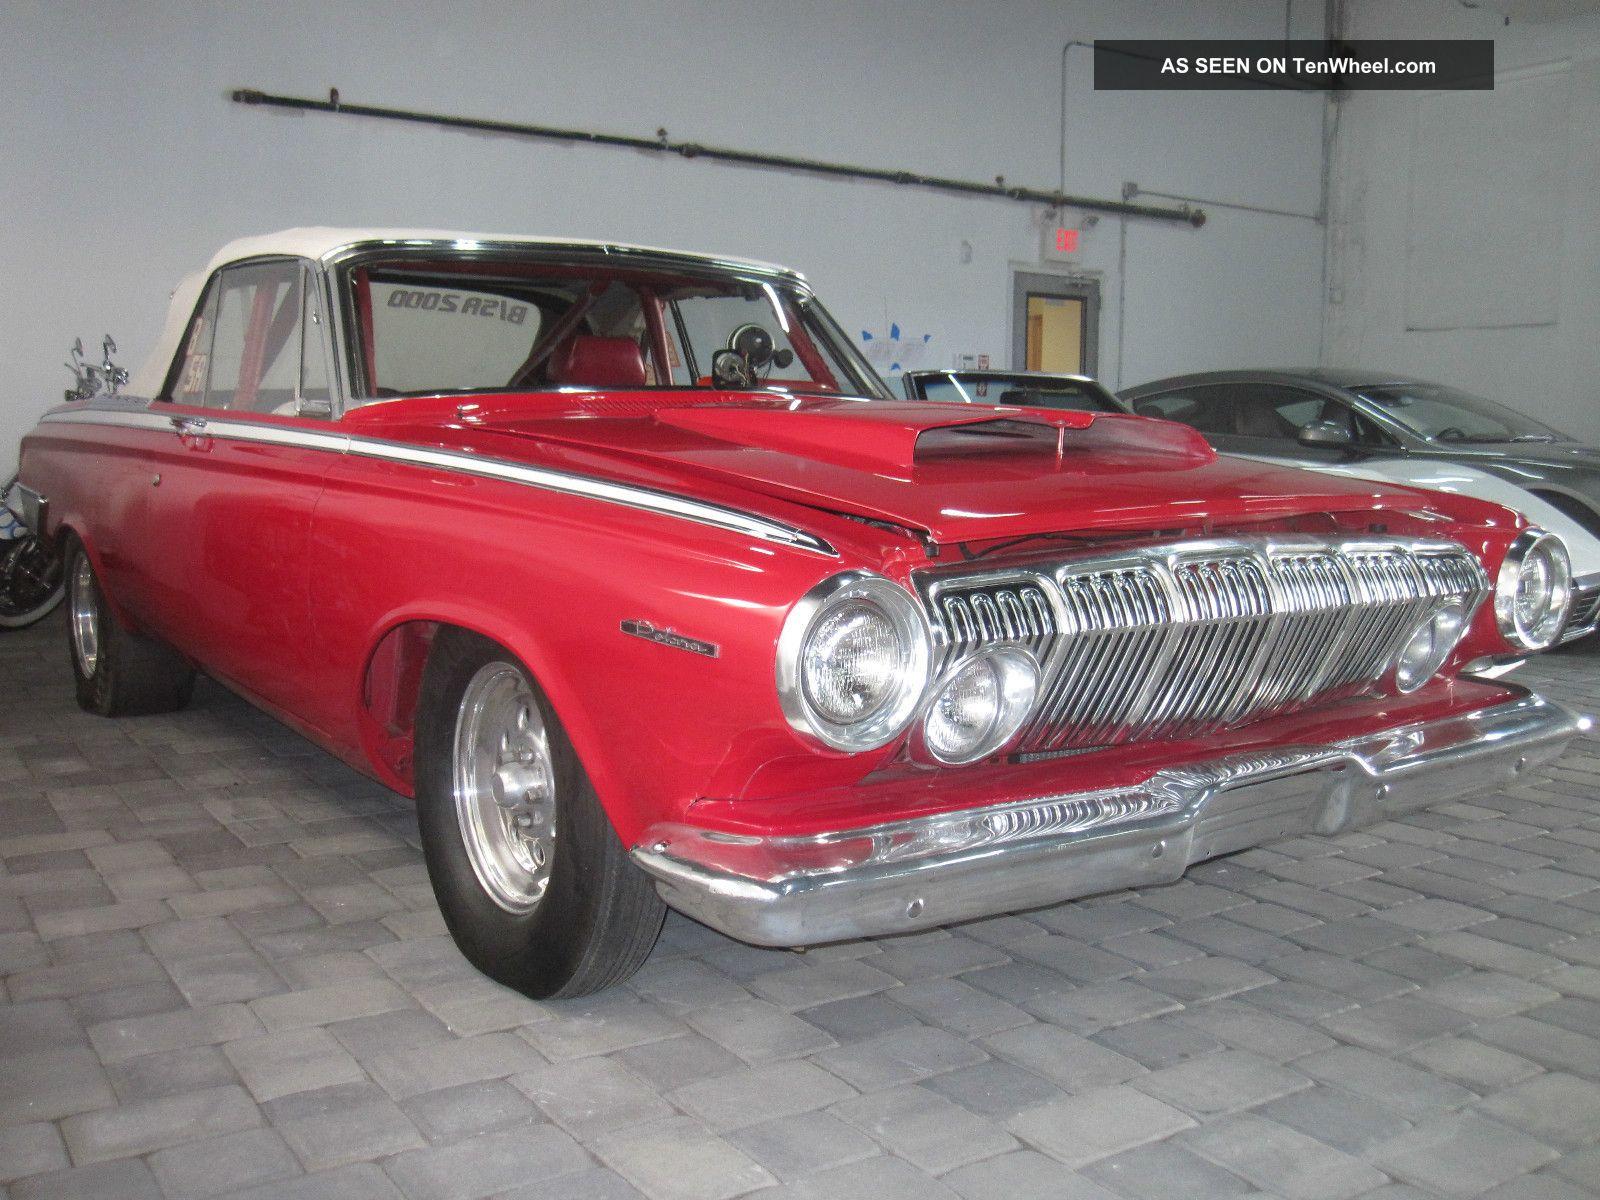 1963 Dodge Polara 500 Max Wedge Convertible,  National Record Holder Other photo